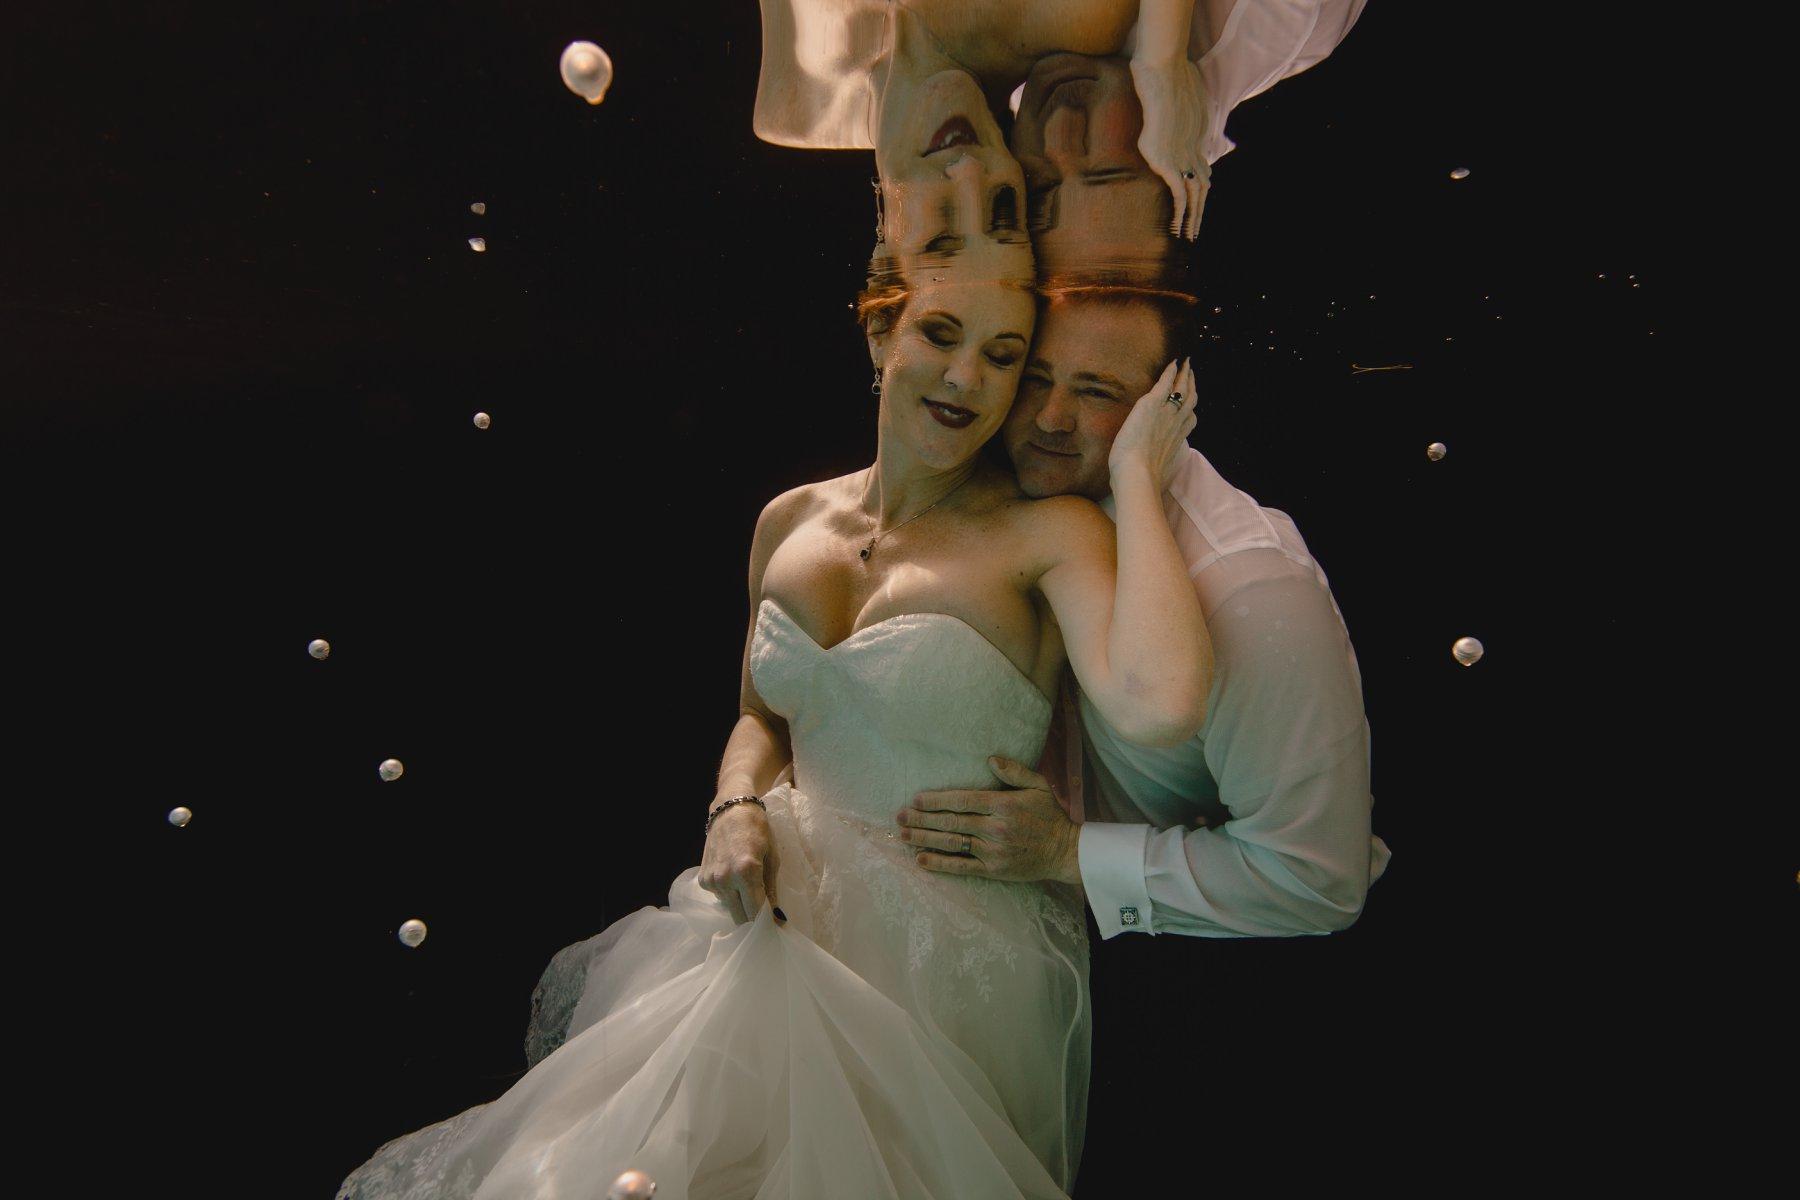 underwater wedding trash the dress photos on black backdrop in a pool Phoenix